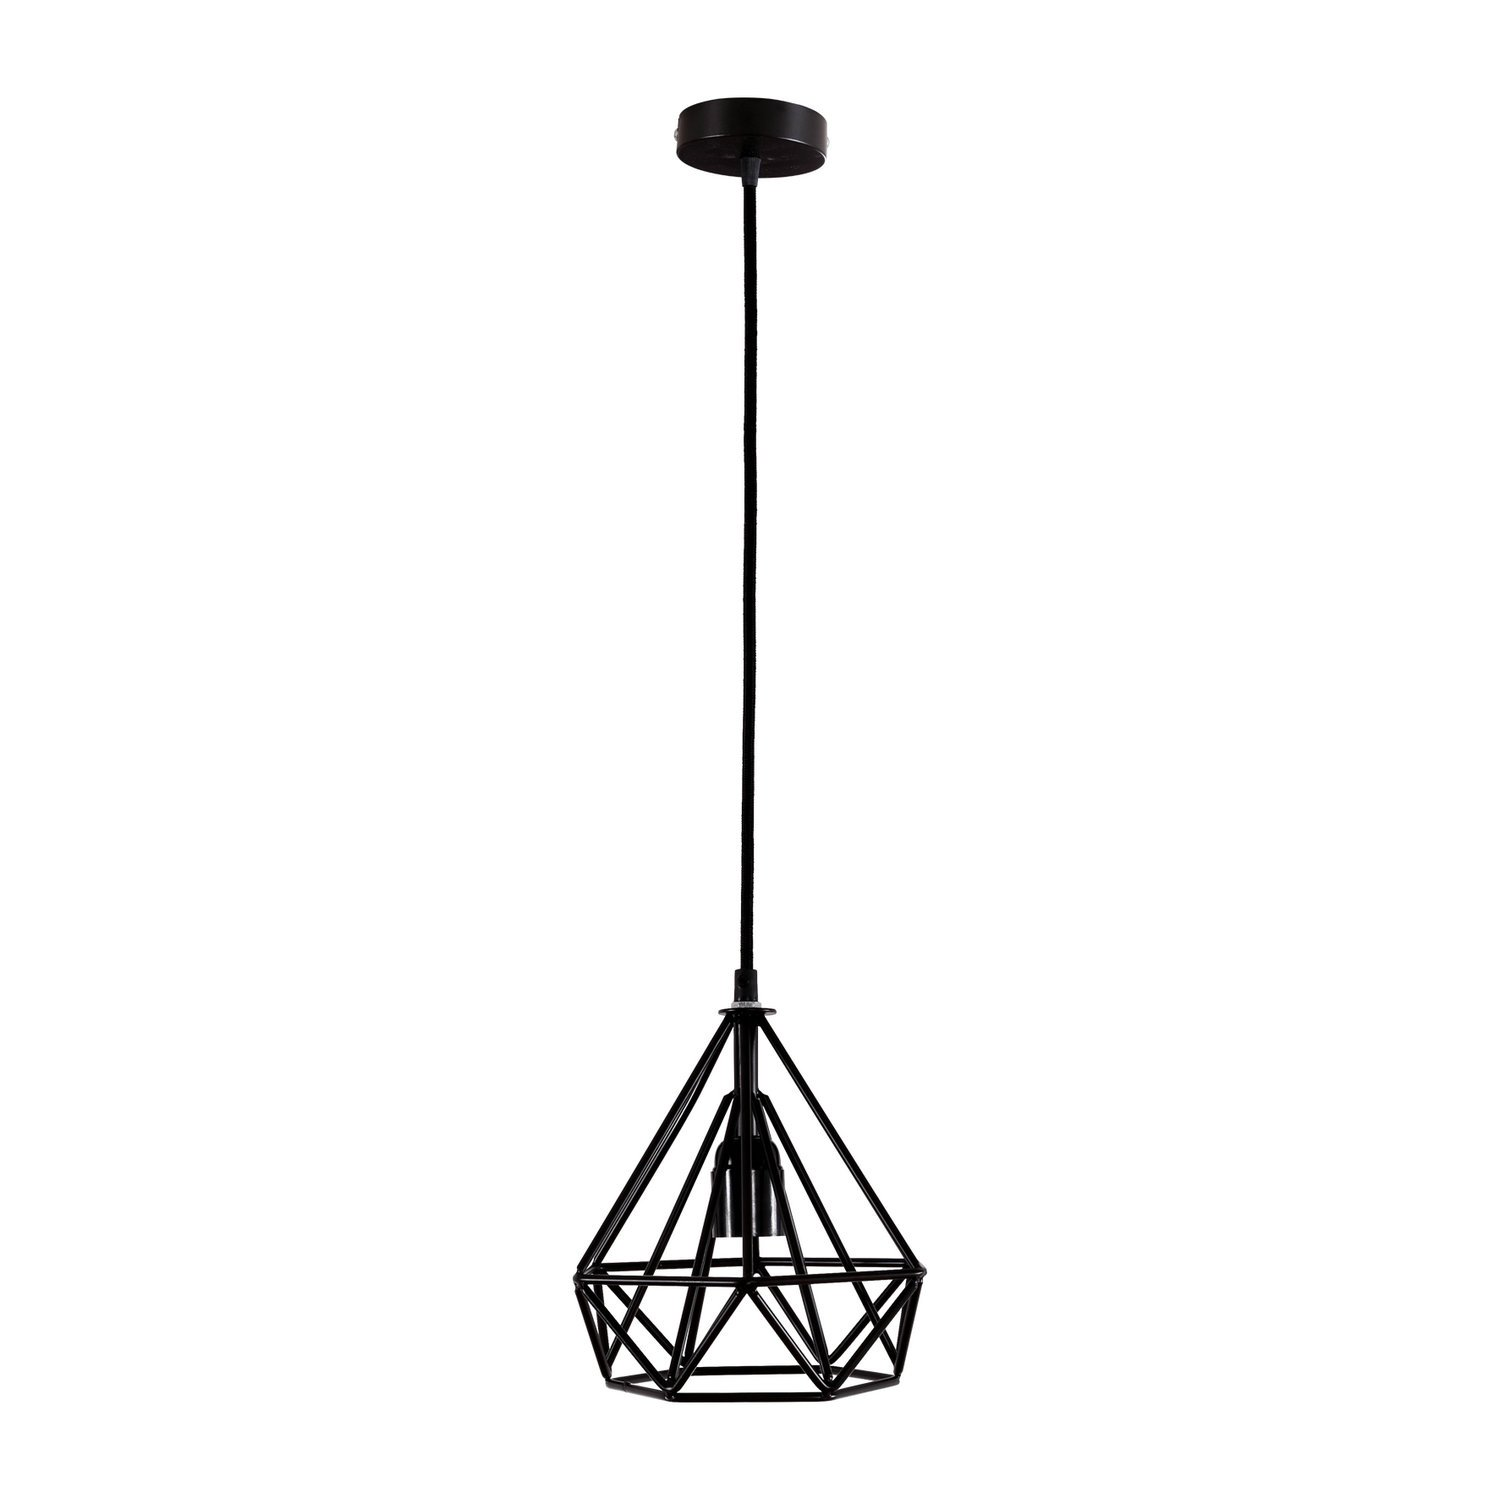 COOLWEST Mini Vintage Edison Hanging Caged Pendant Light Fixture Adjustable Cord